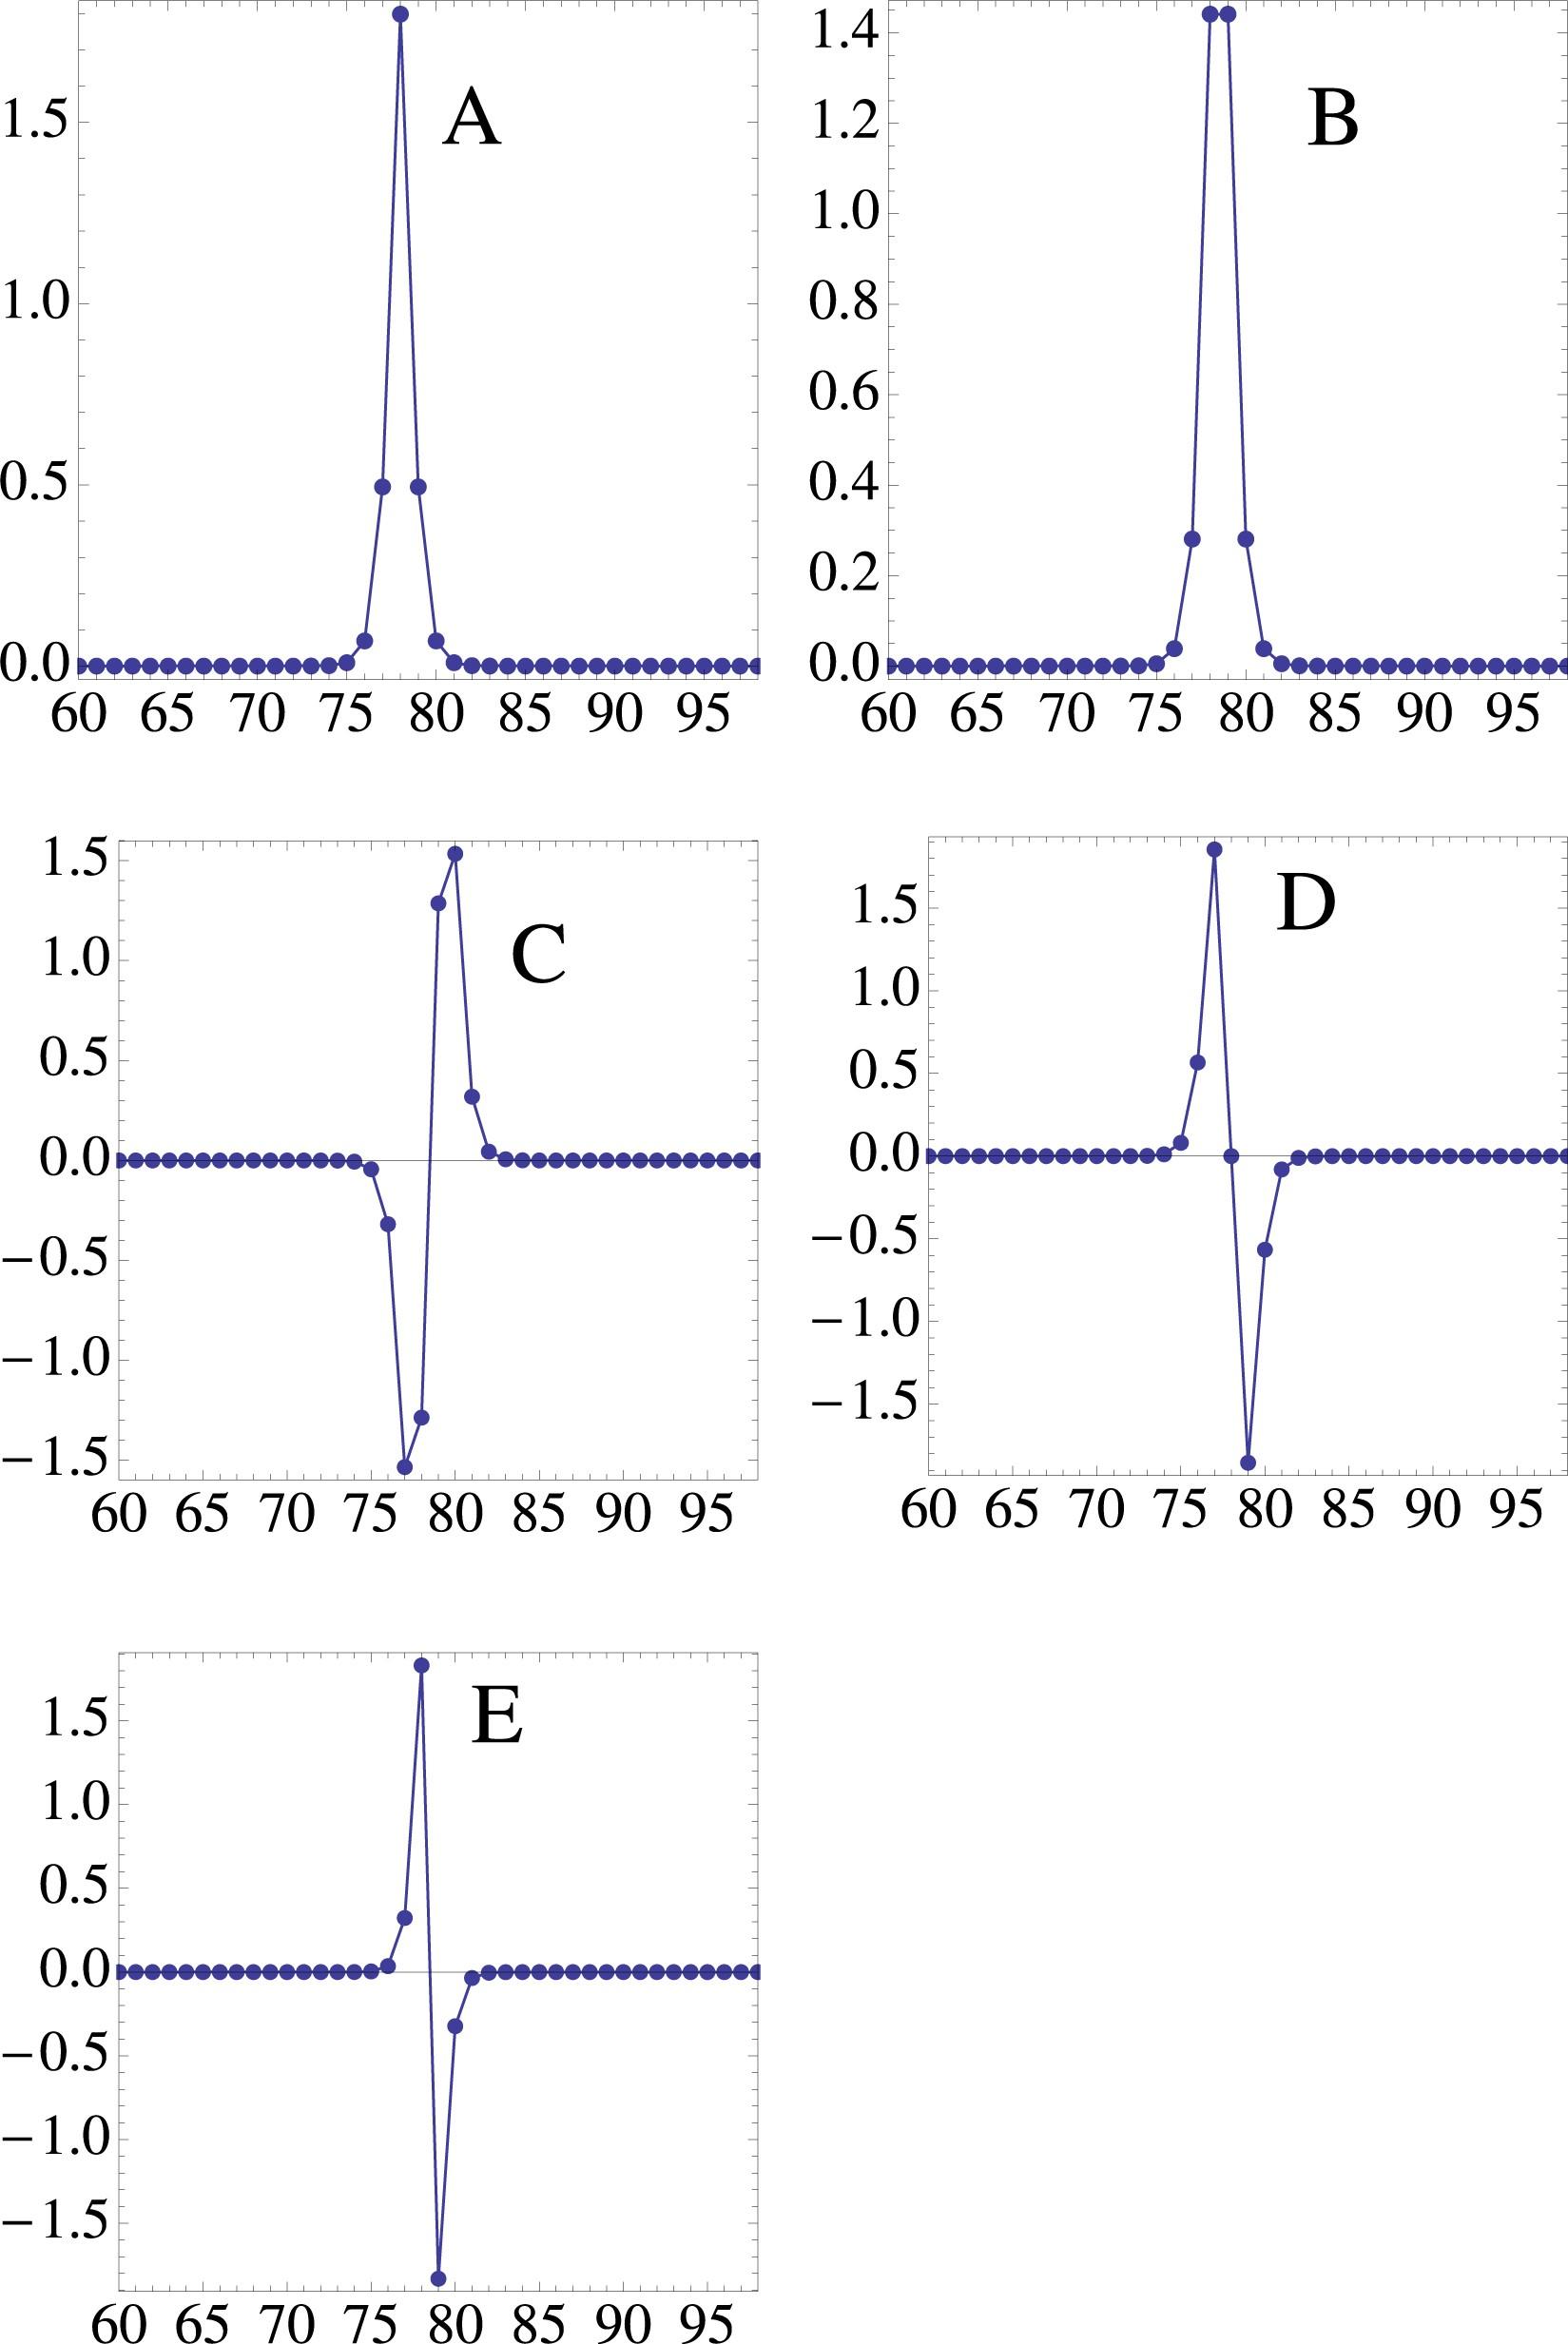 Solitons in a modified discrete nonlinear Schrödinger